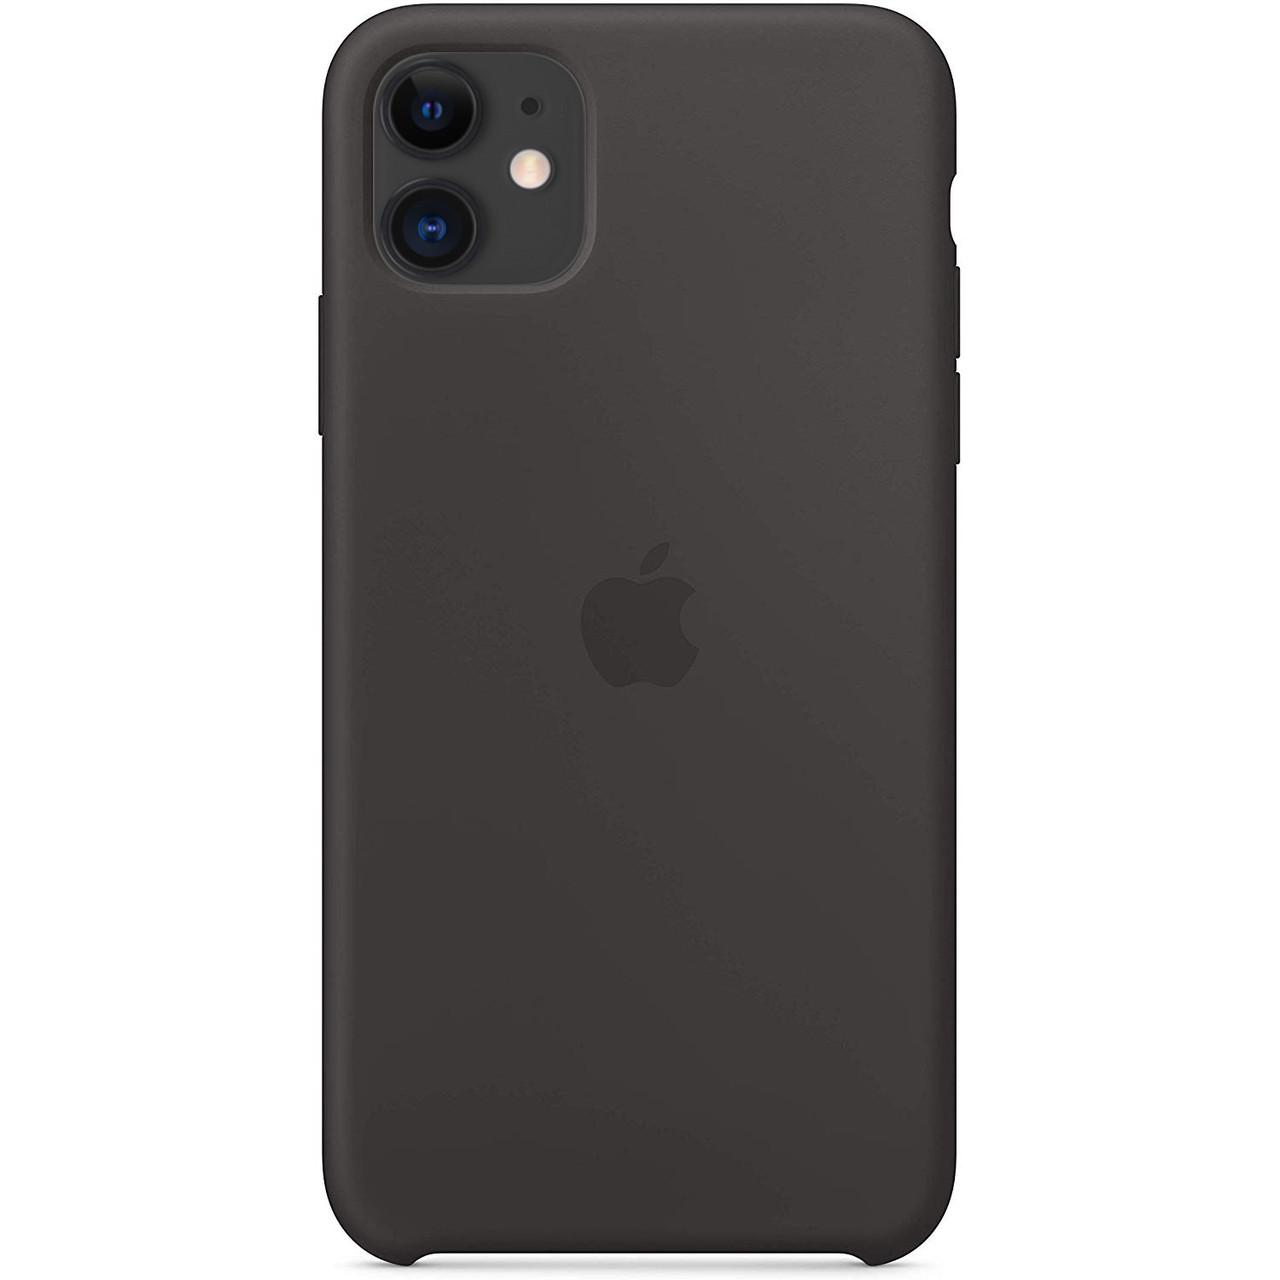 "Чехол Silicone case (AAA) для Apple iPhone 11 (6.1"") Черный / Black"